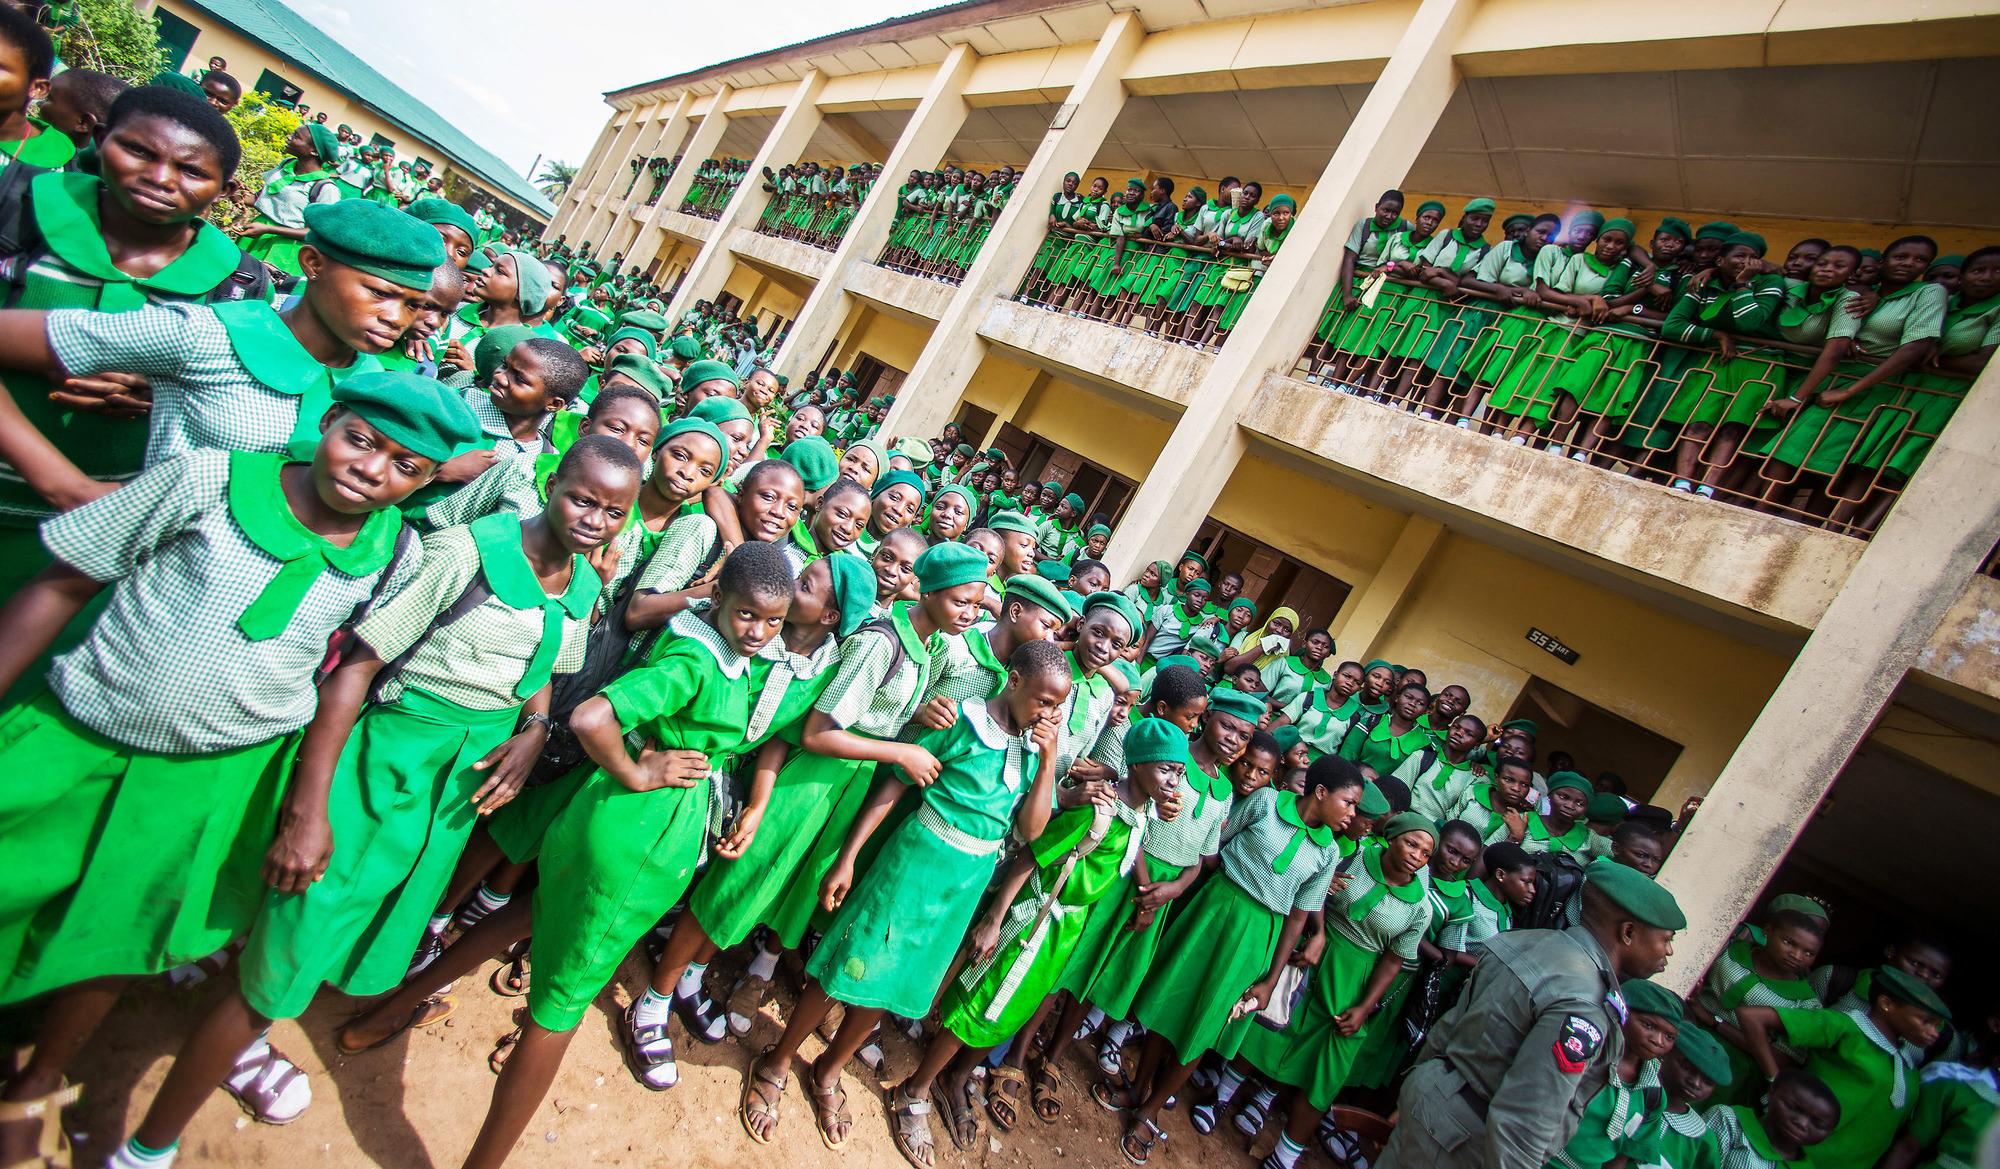 «La jeunesse nigériane est une bombe à retardement», selon l'ex-chef d'État (ici à Ijebu Ode).